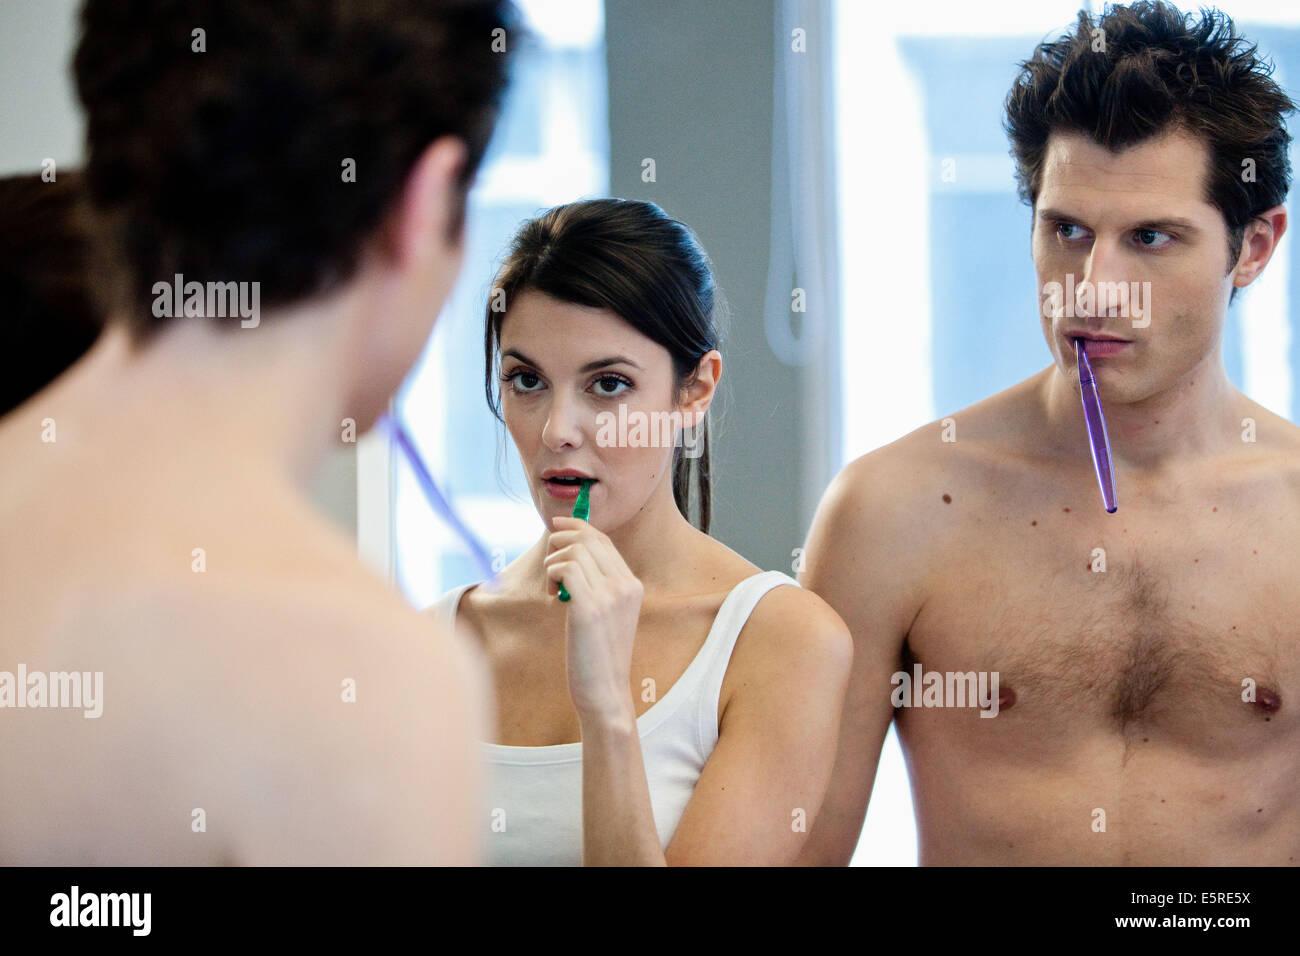 Couple brushing teeth. - Stock Image